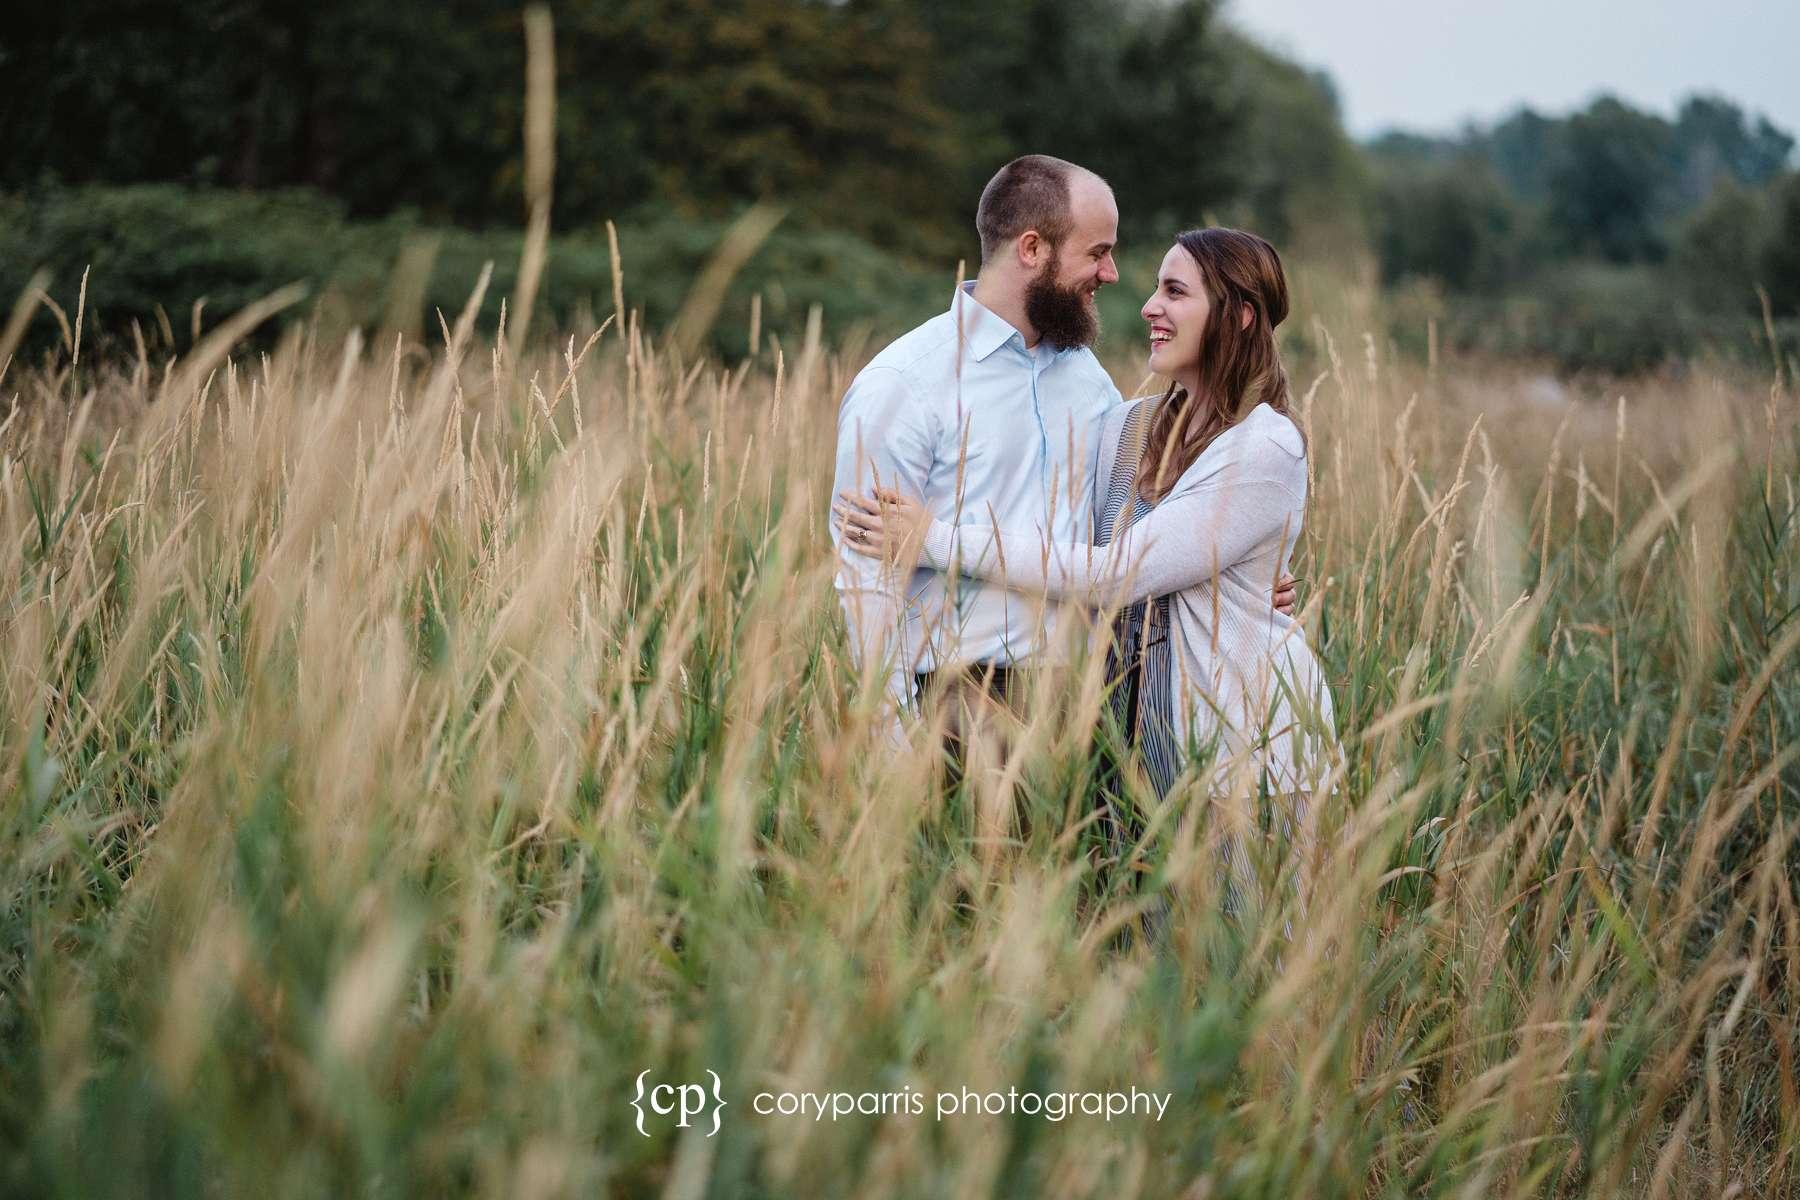 049-Engagement-Portraits-Marrymoor-Park.jpg